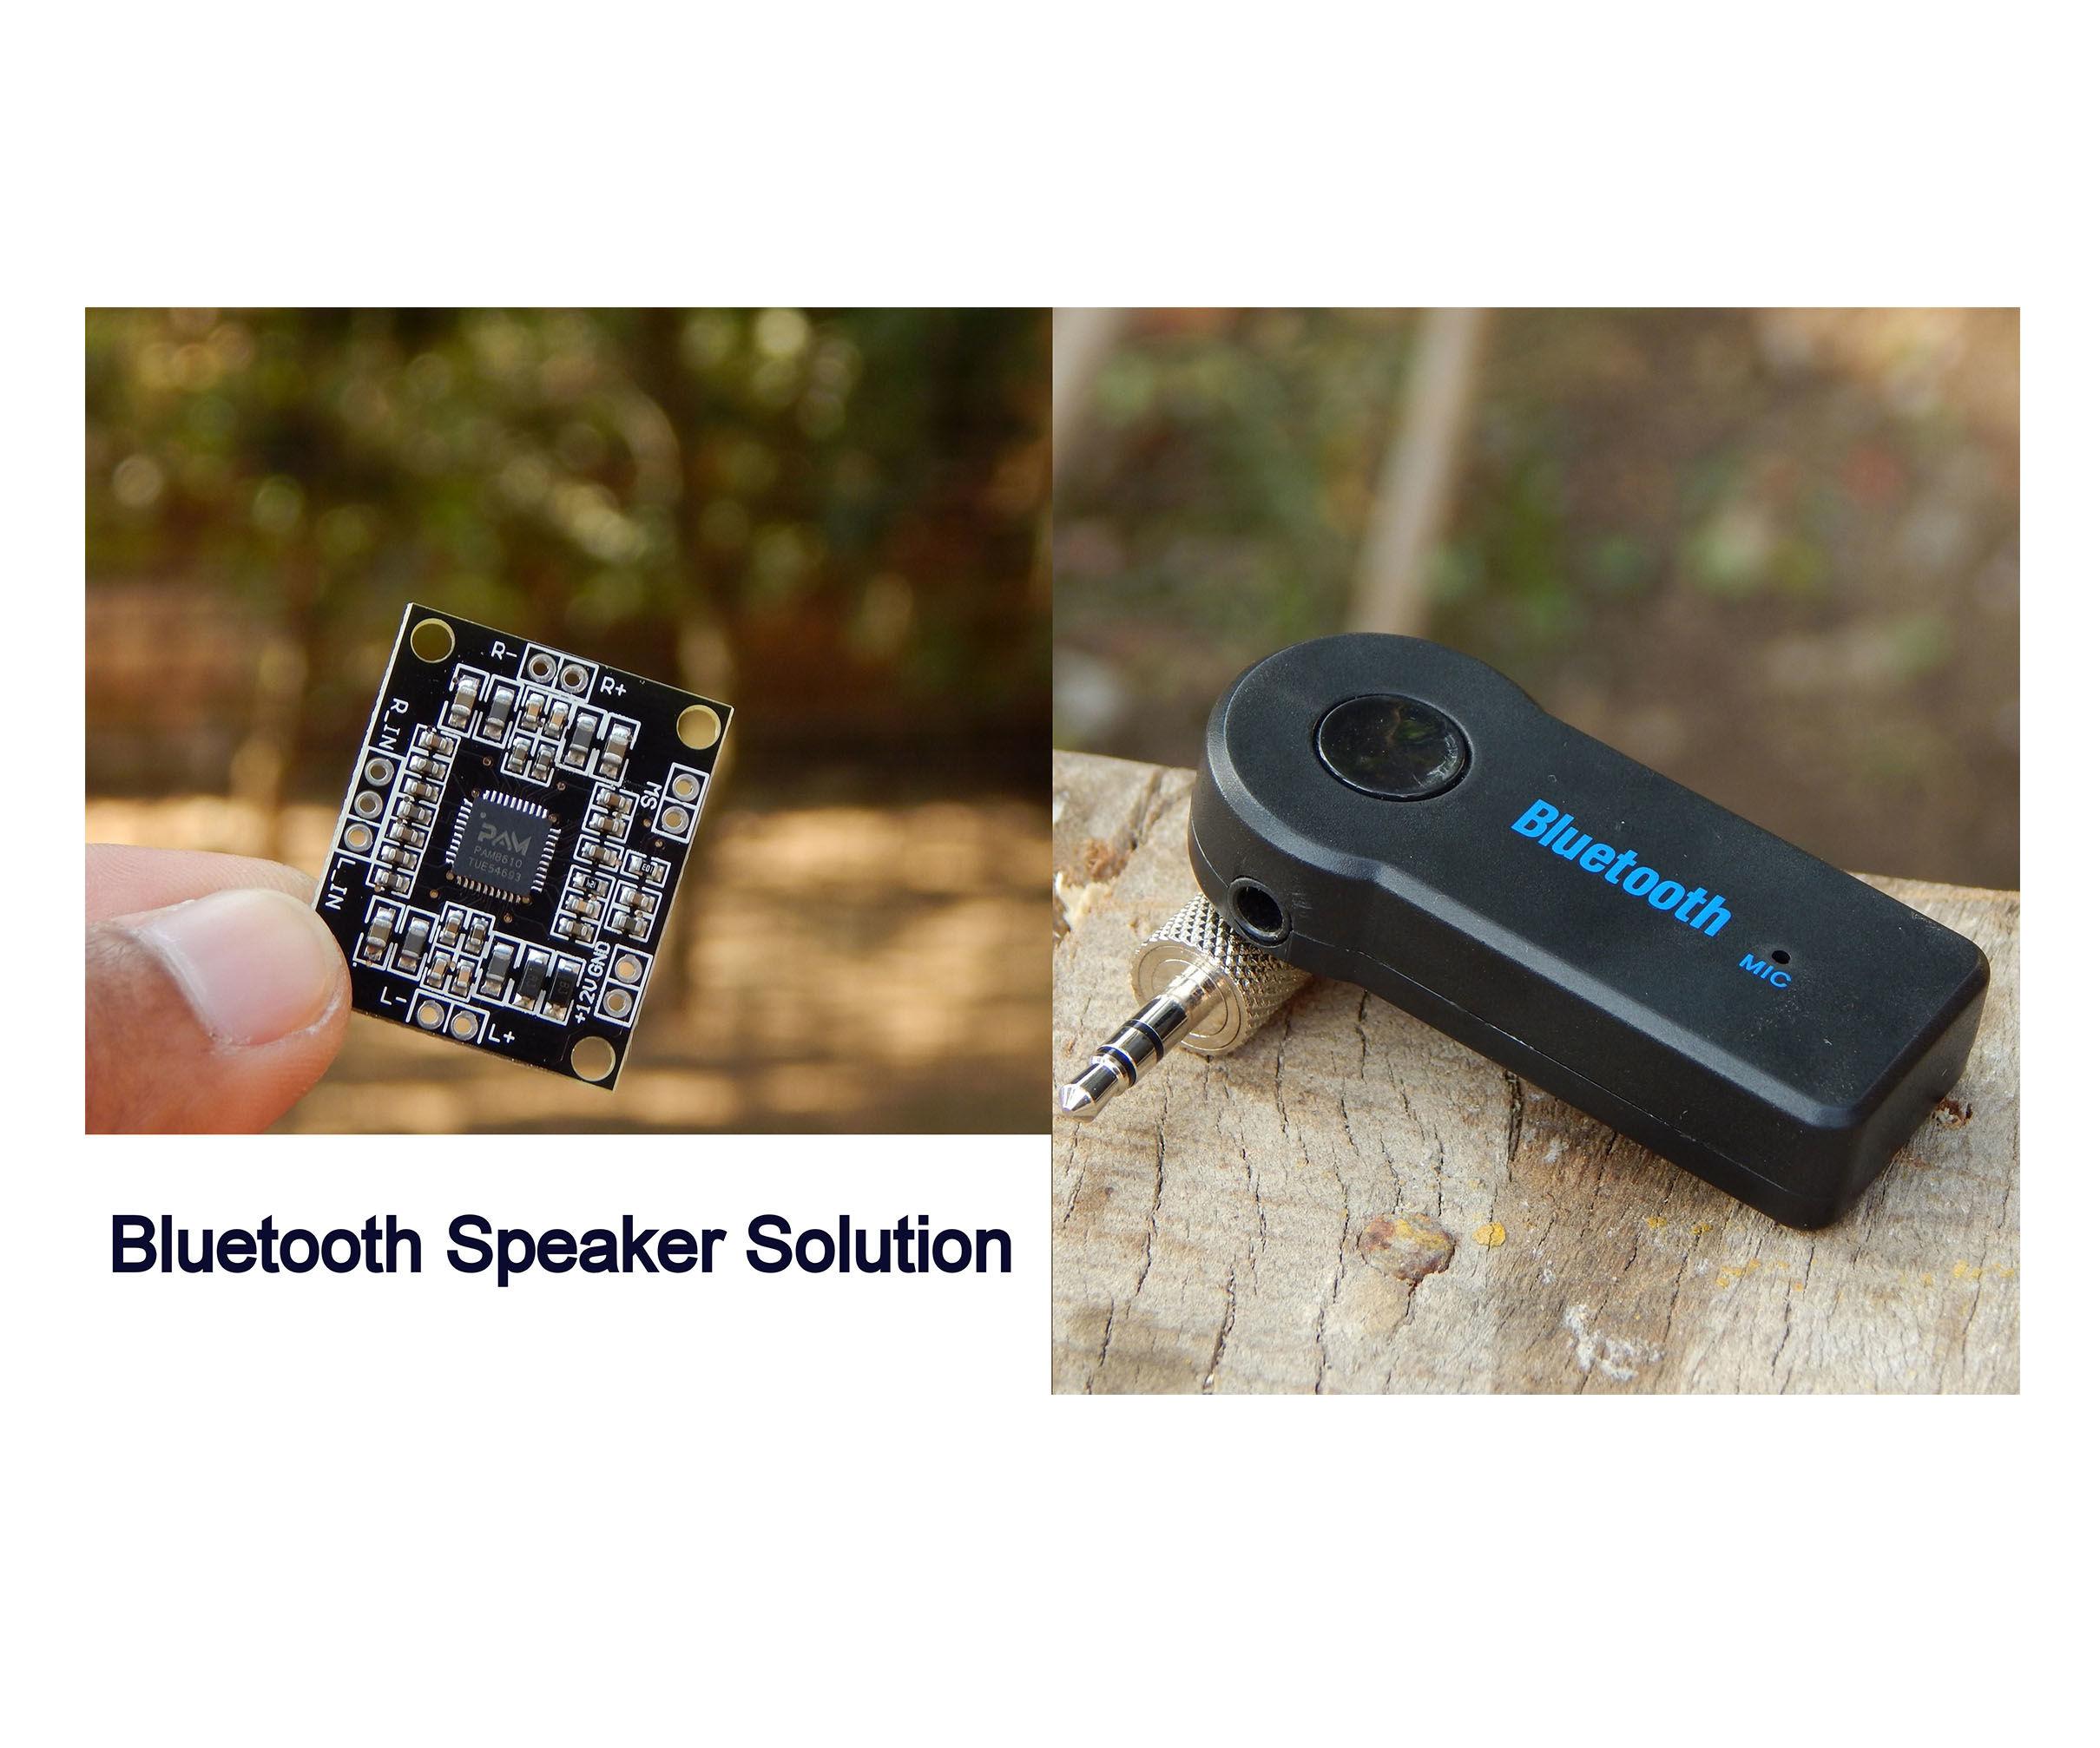 4$ Bluetooth Speaker Solution